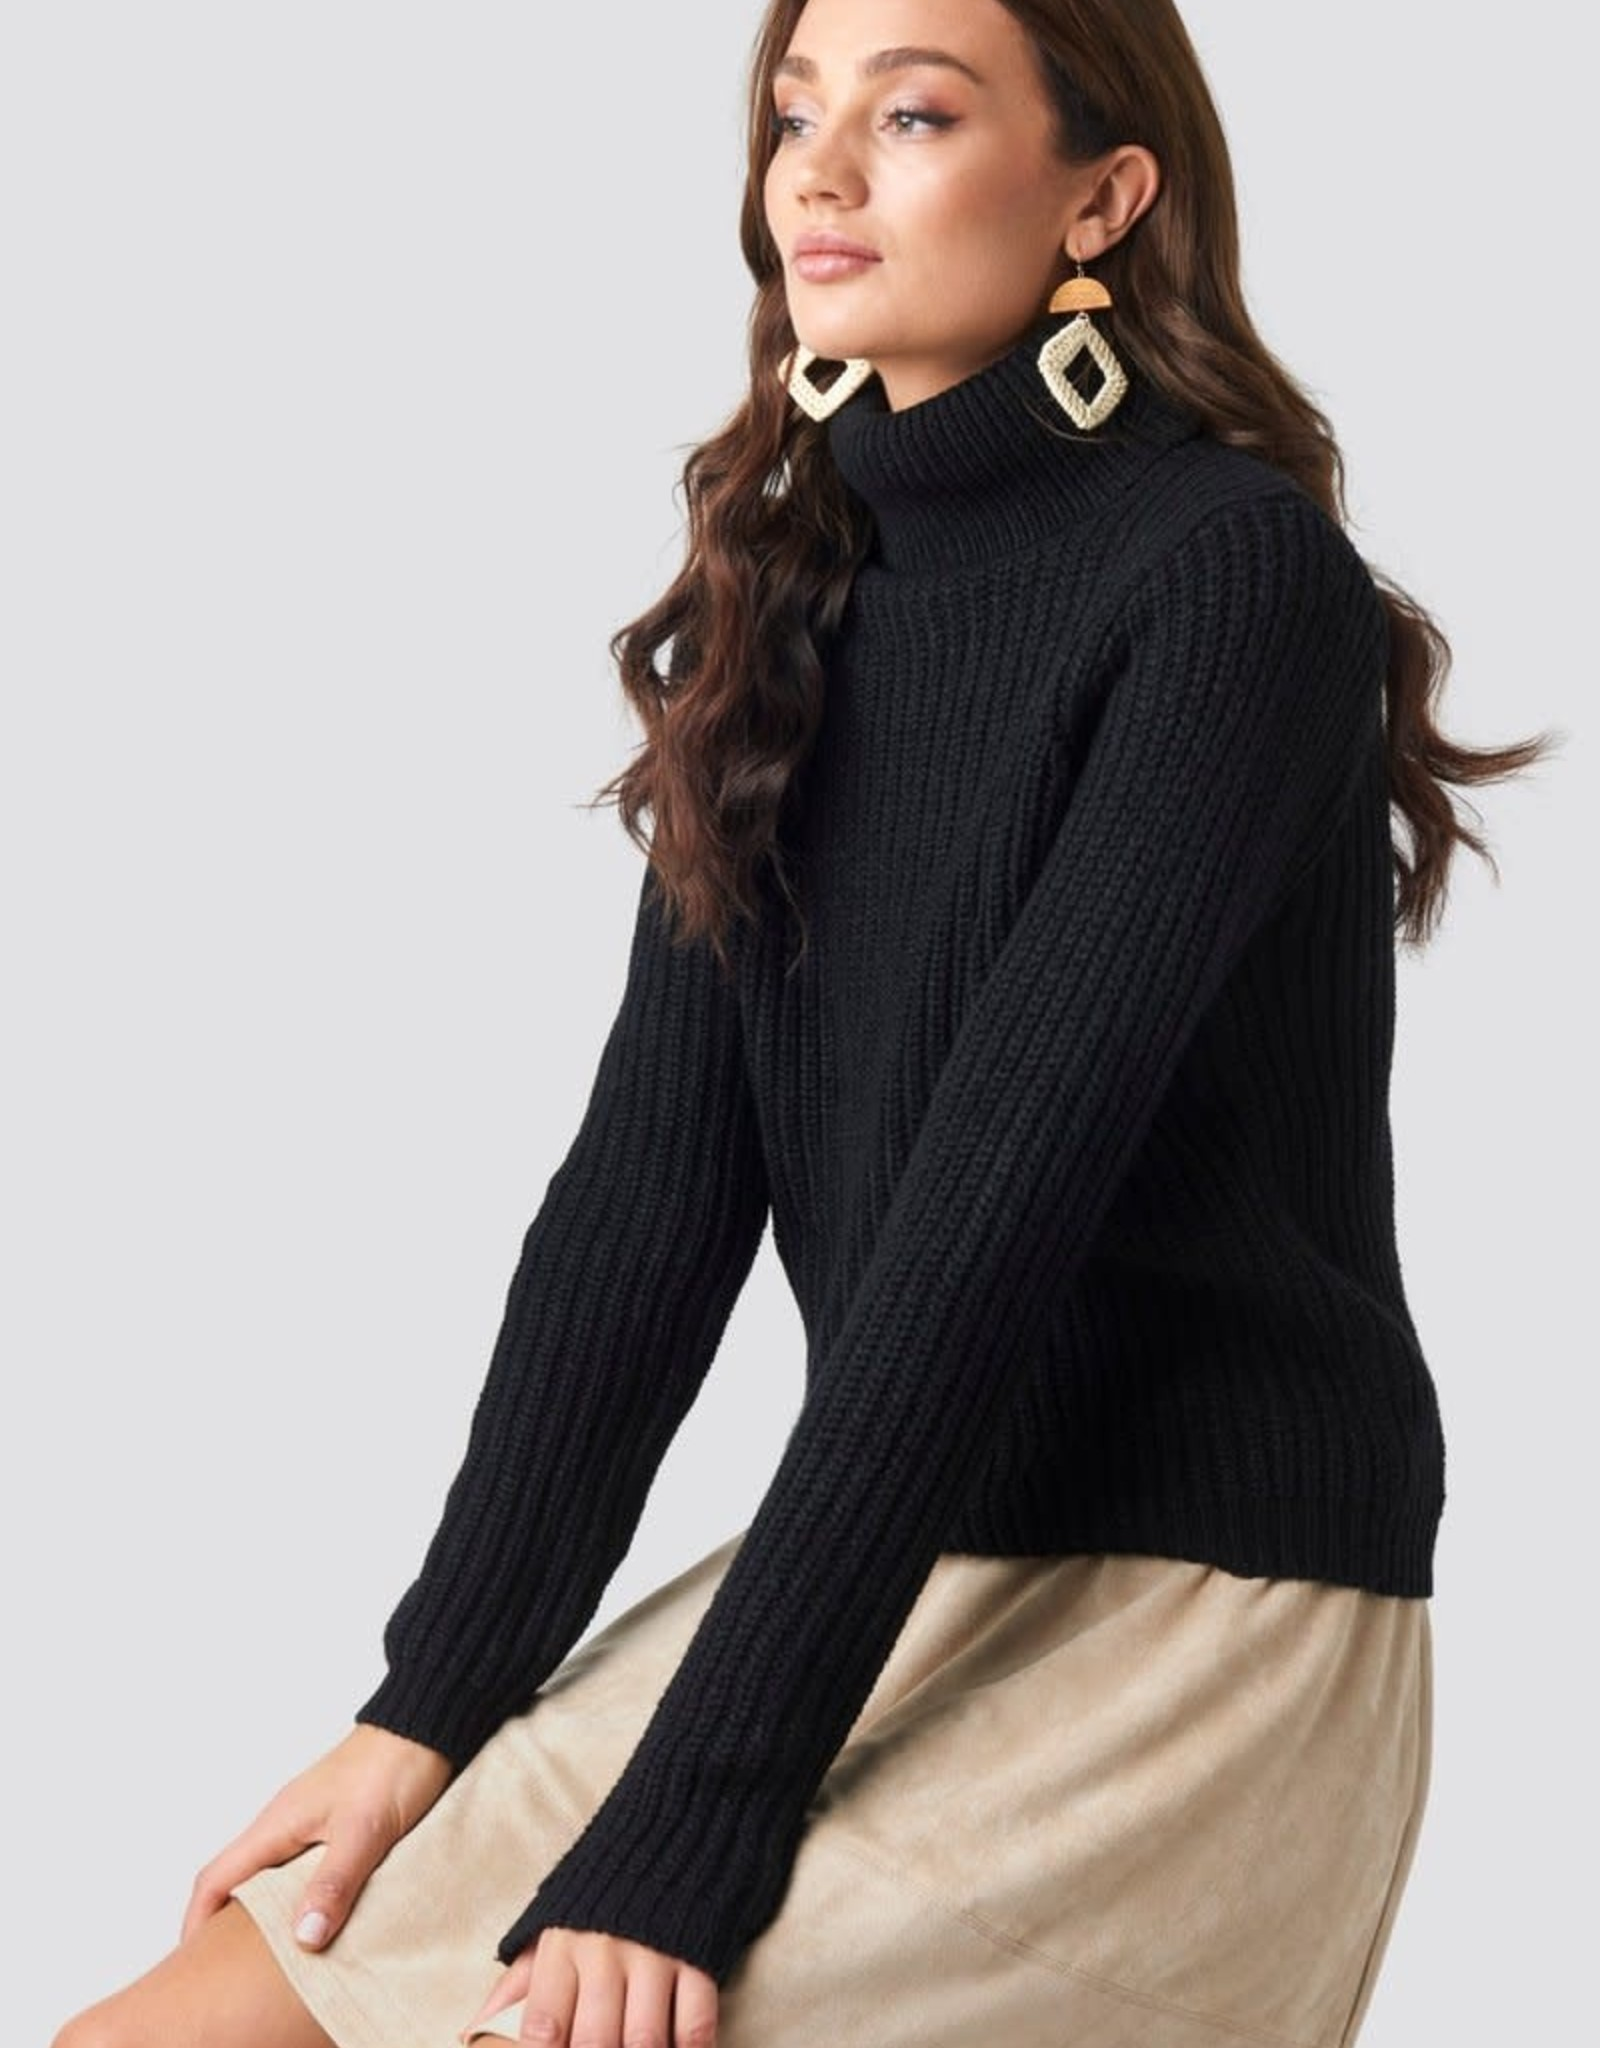 Rut&Circle Tinelle Rollneck Knit Black